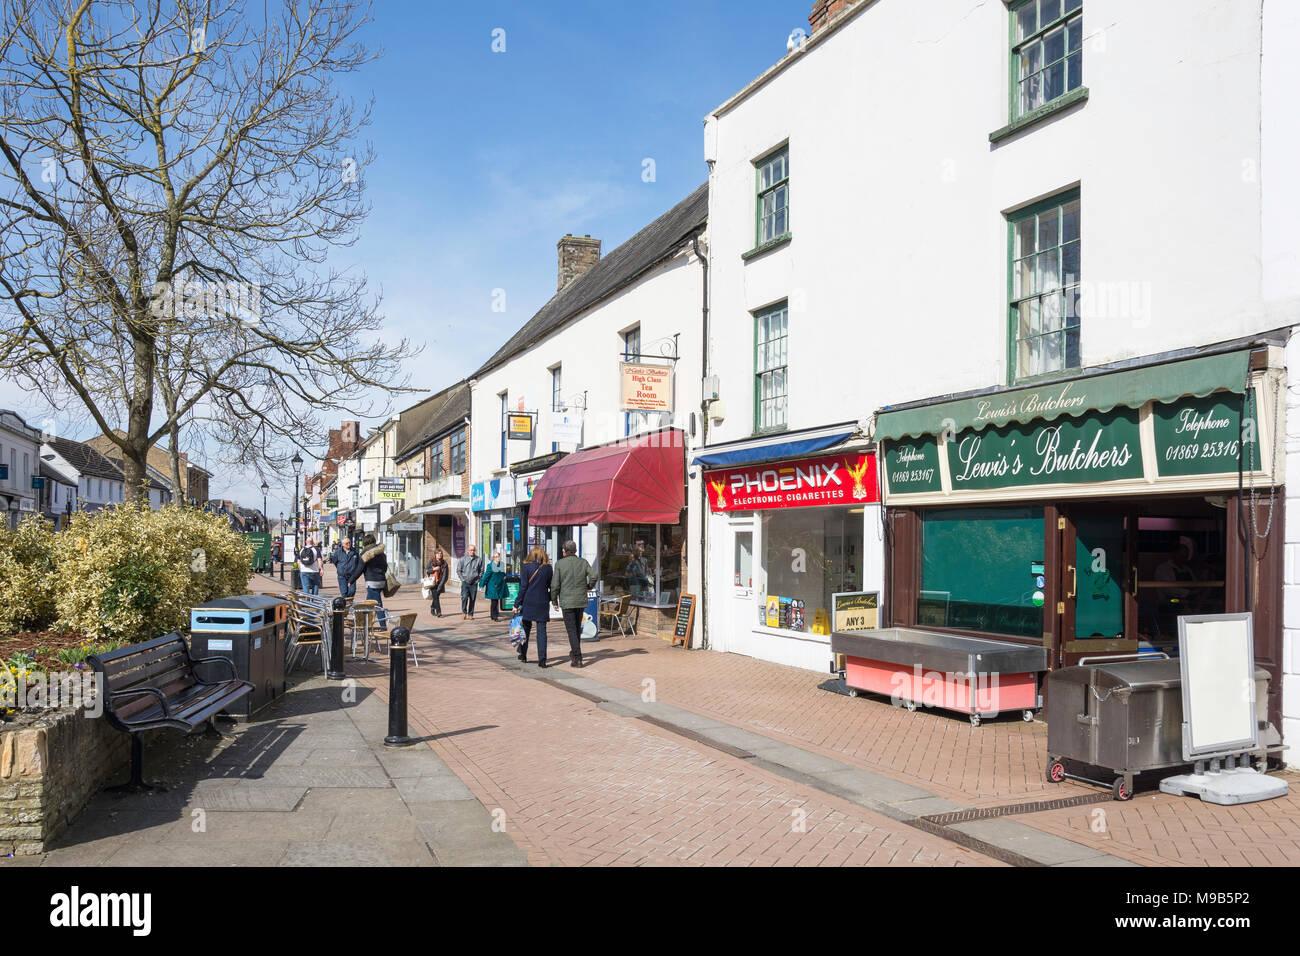 Sheep Street, Bicester, Oxfordshire, England, United Kingdom - Stock Image